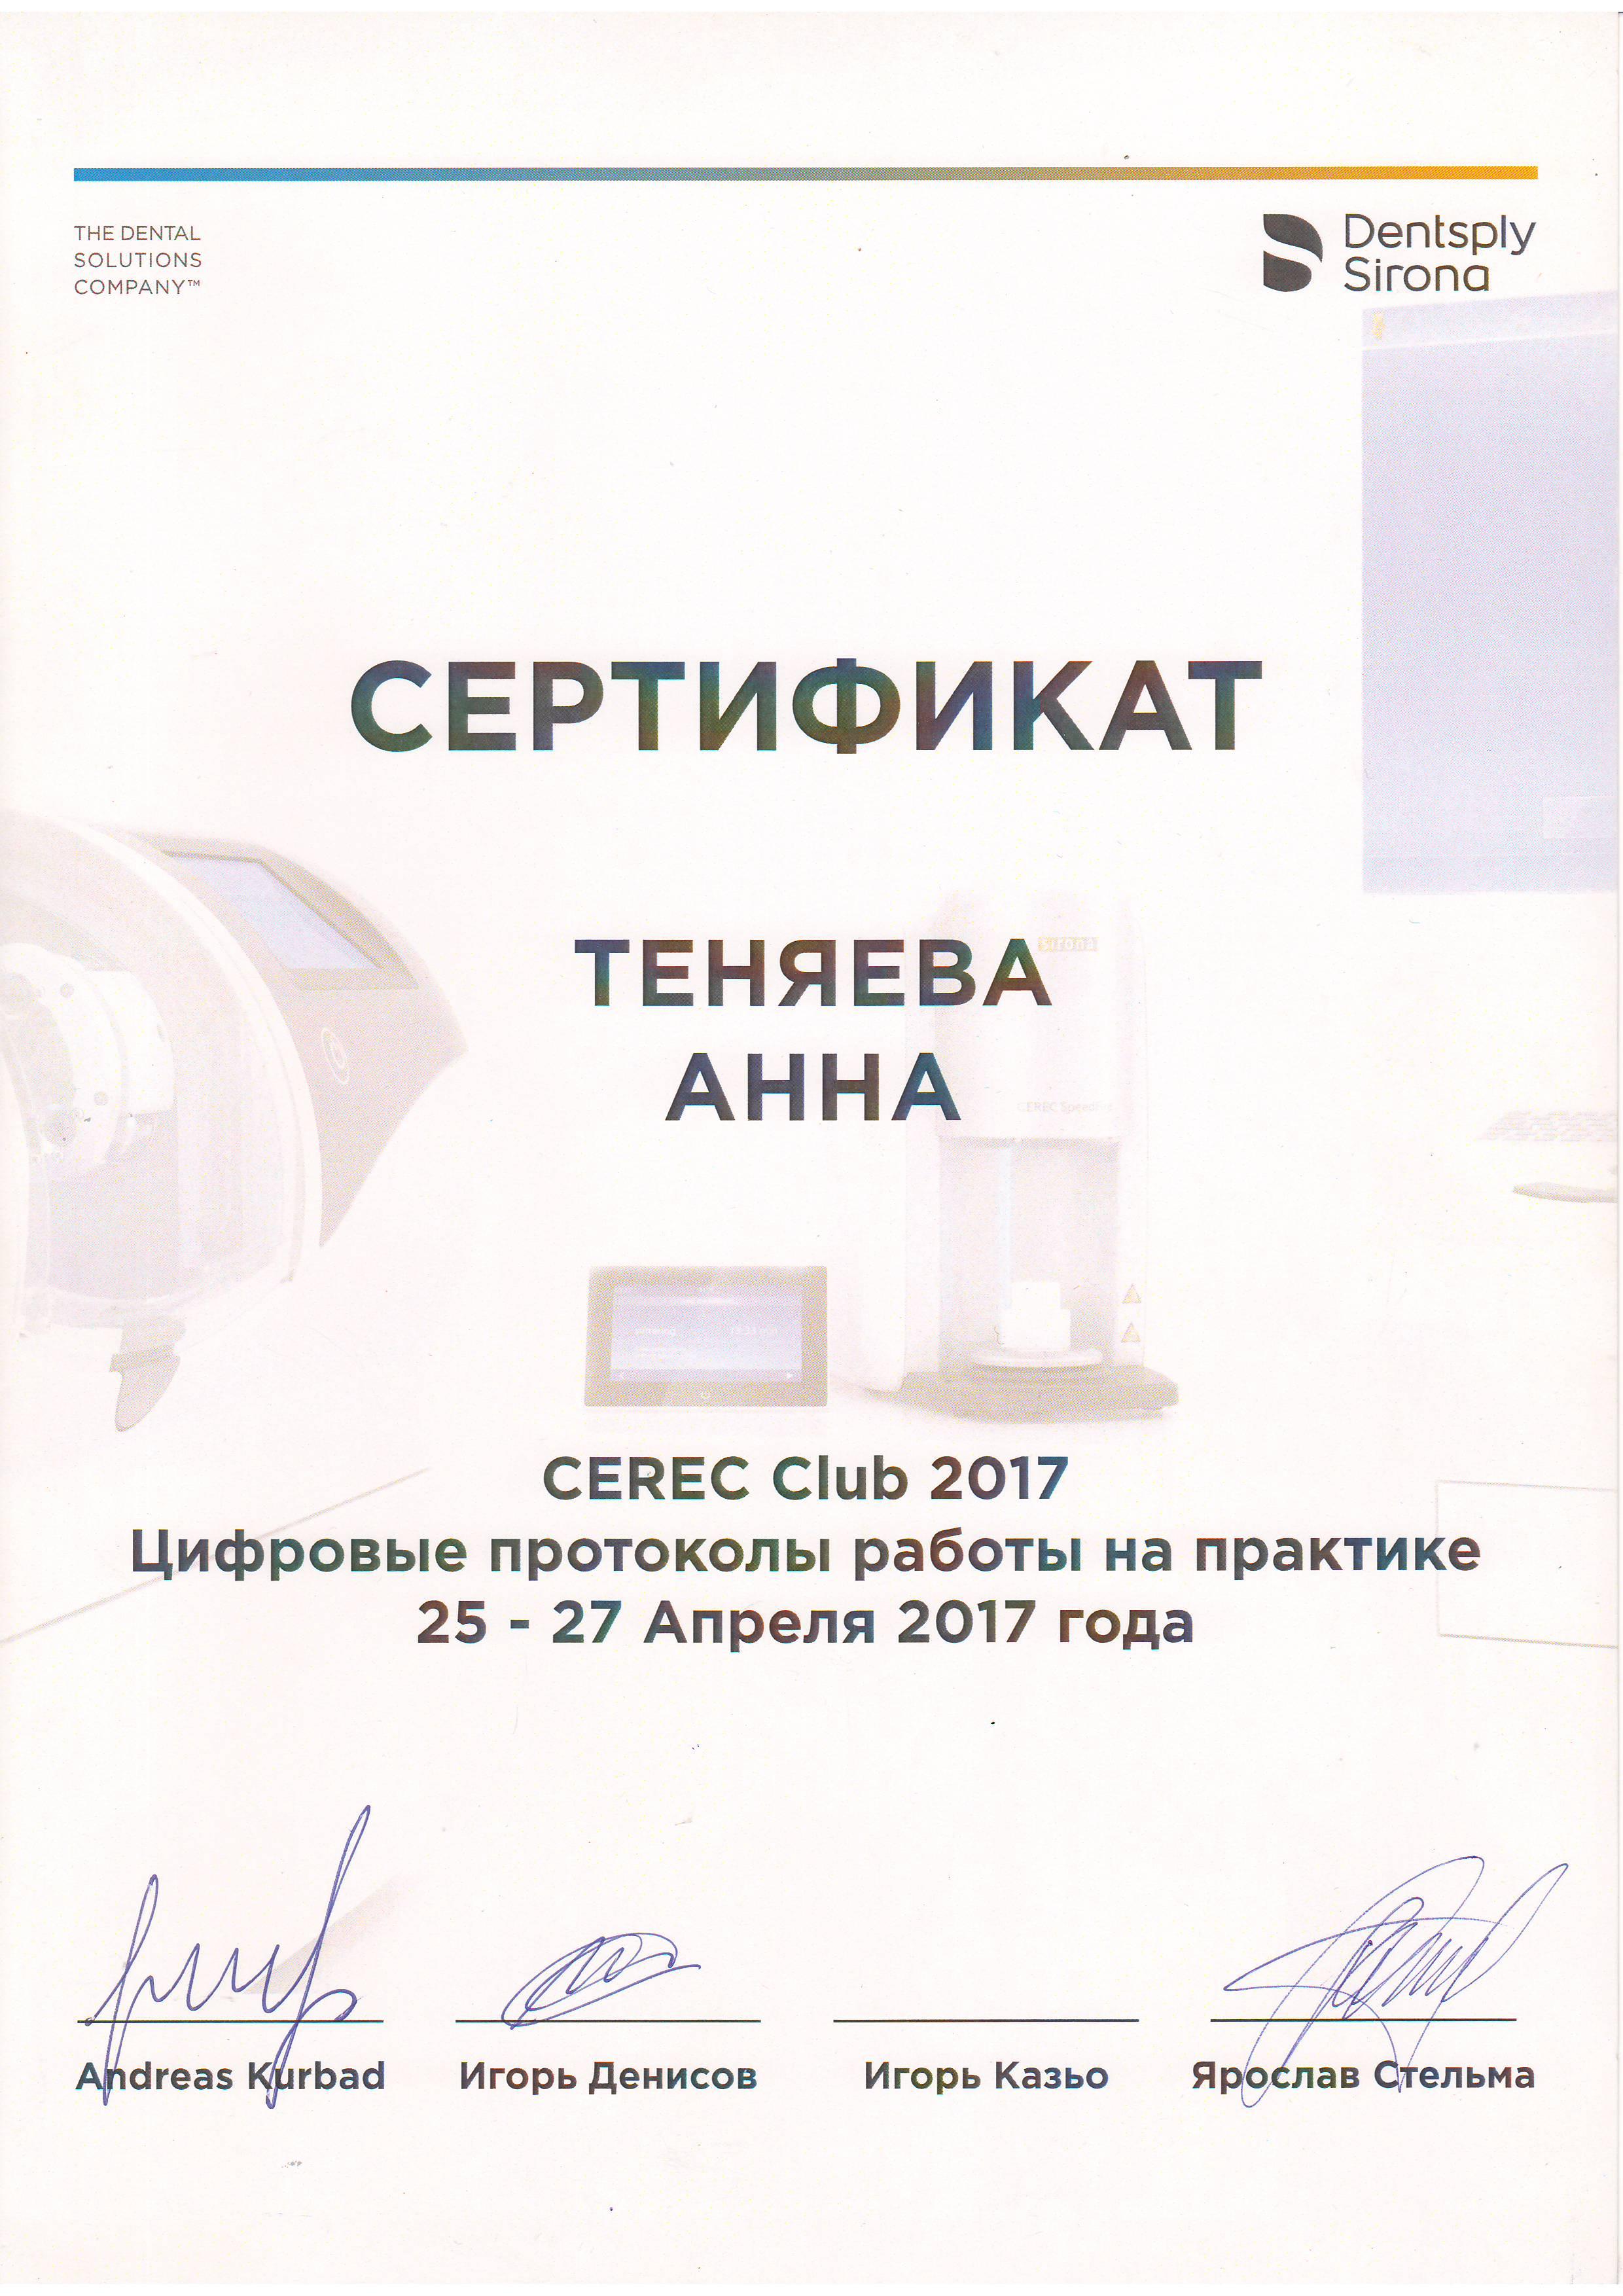 Сертификат 66